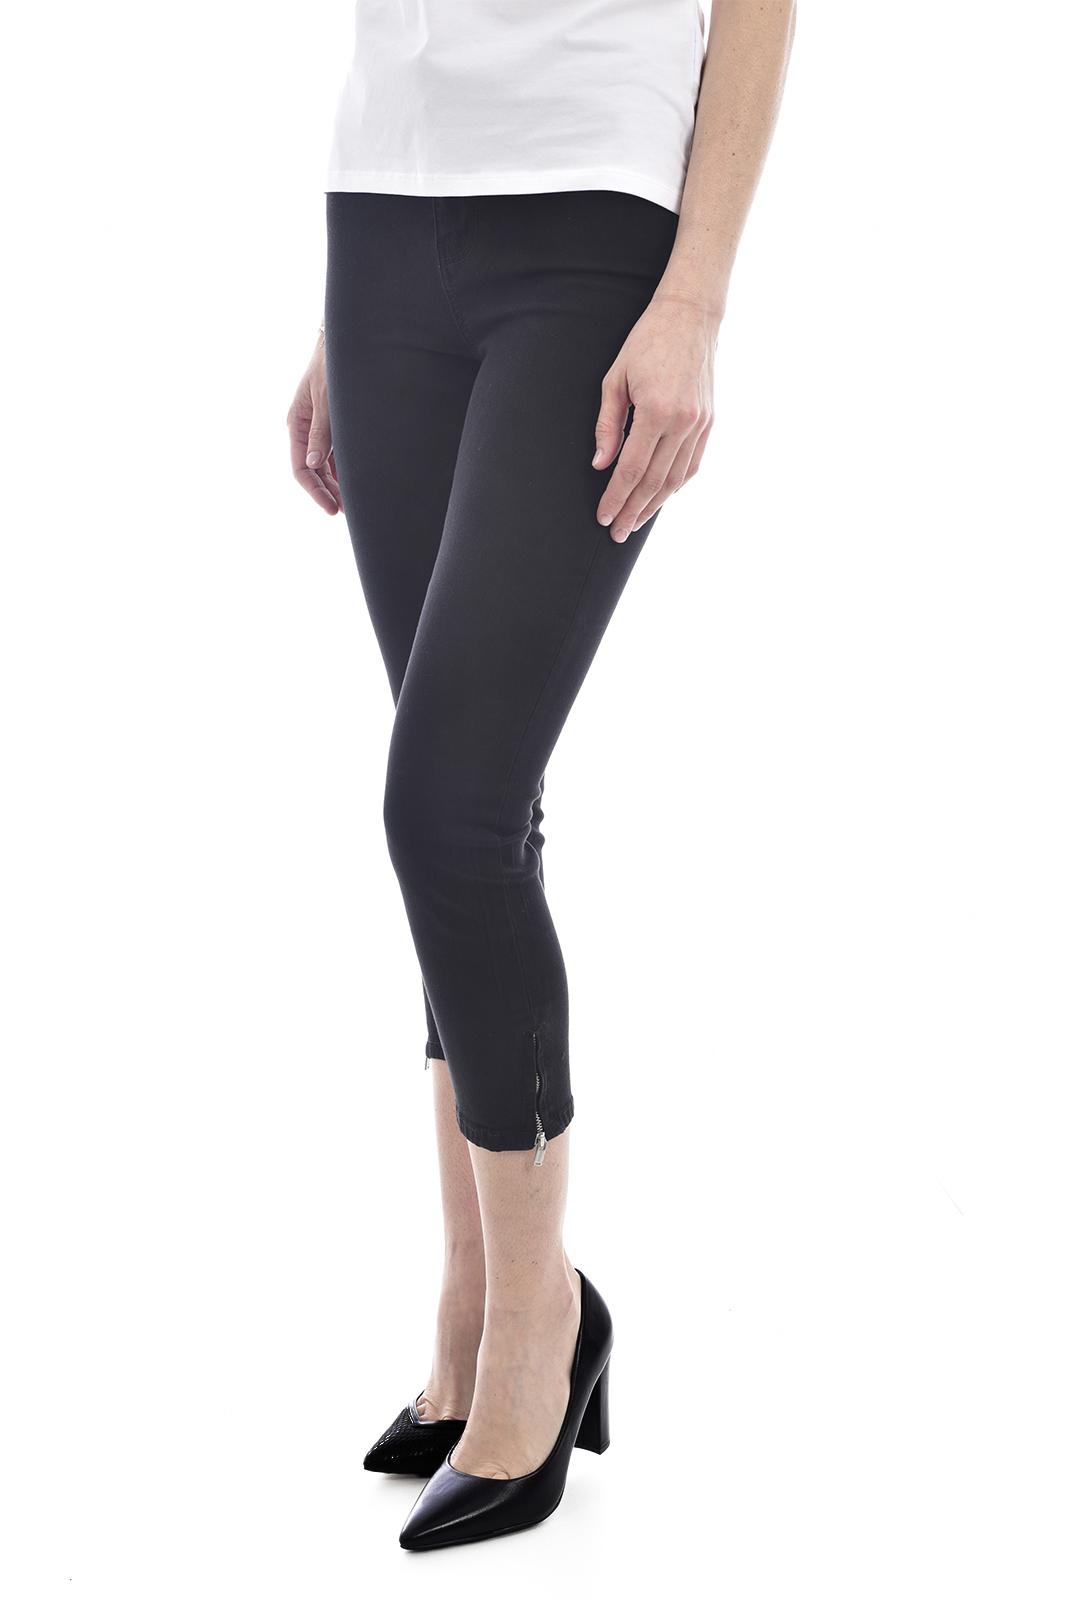 Femme  Guess jeans W02A18 WAMB31981 RI JBLKNoir de jais